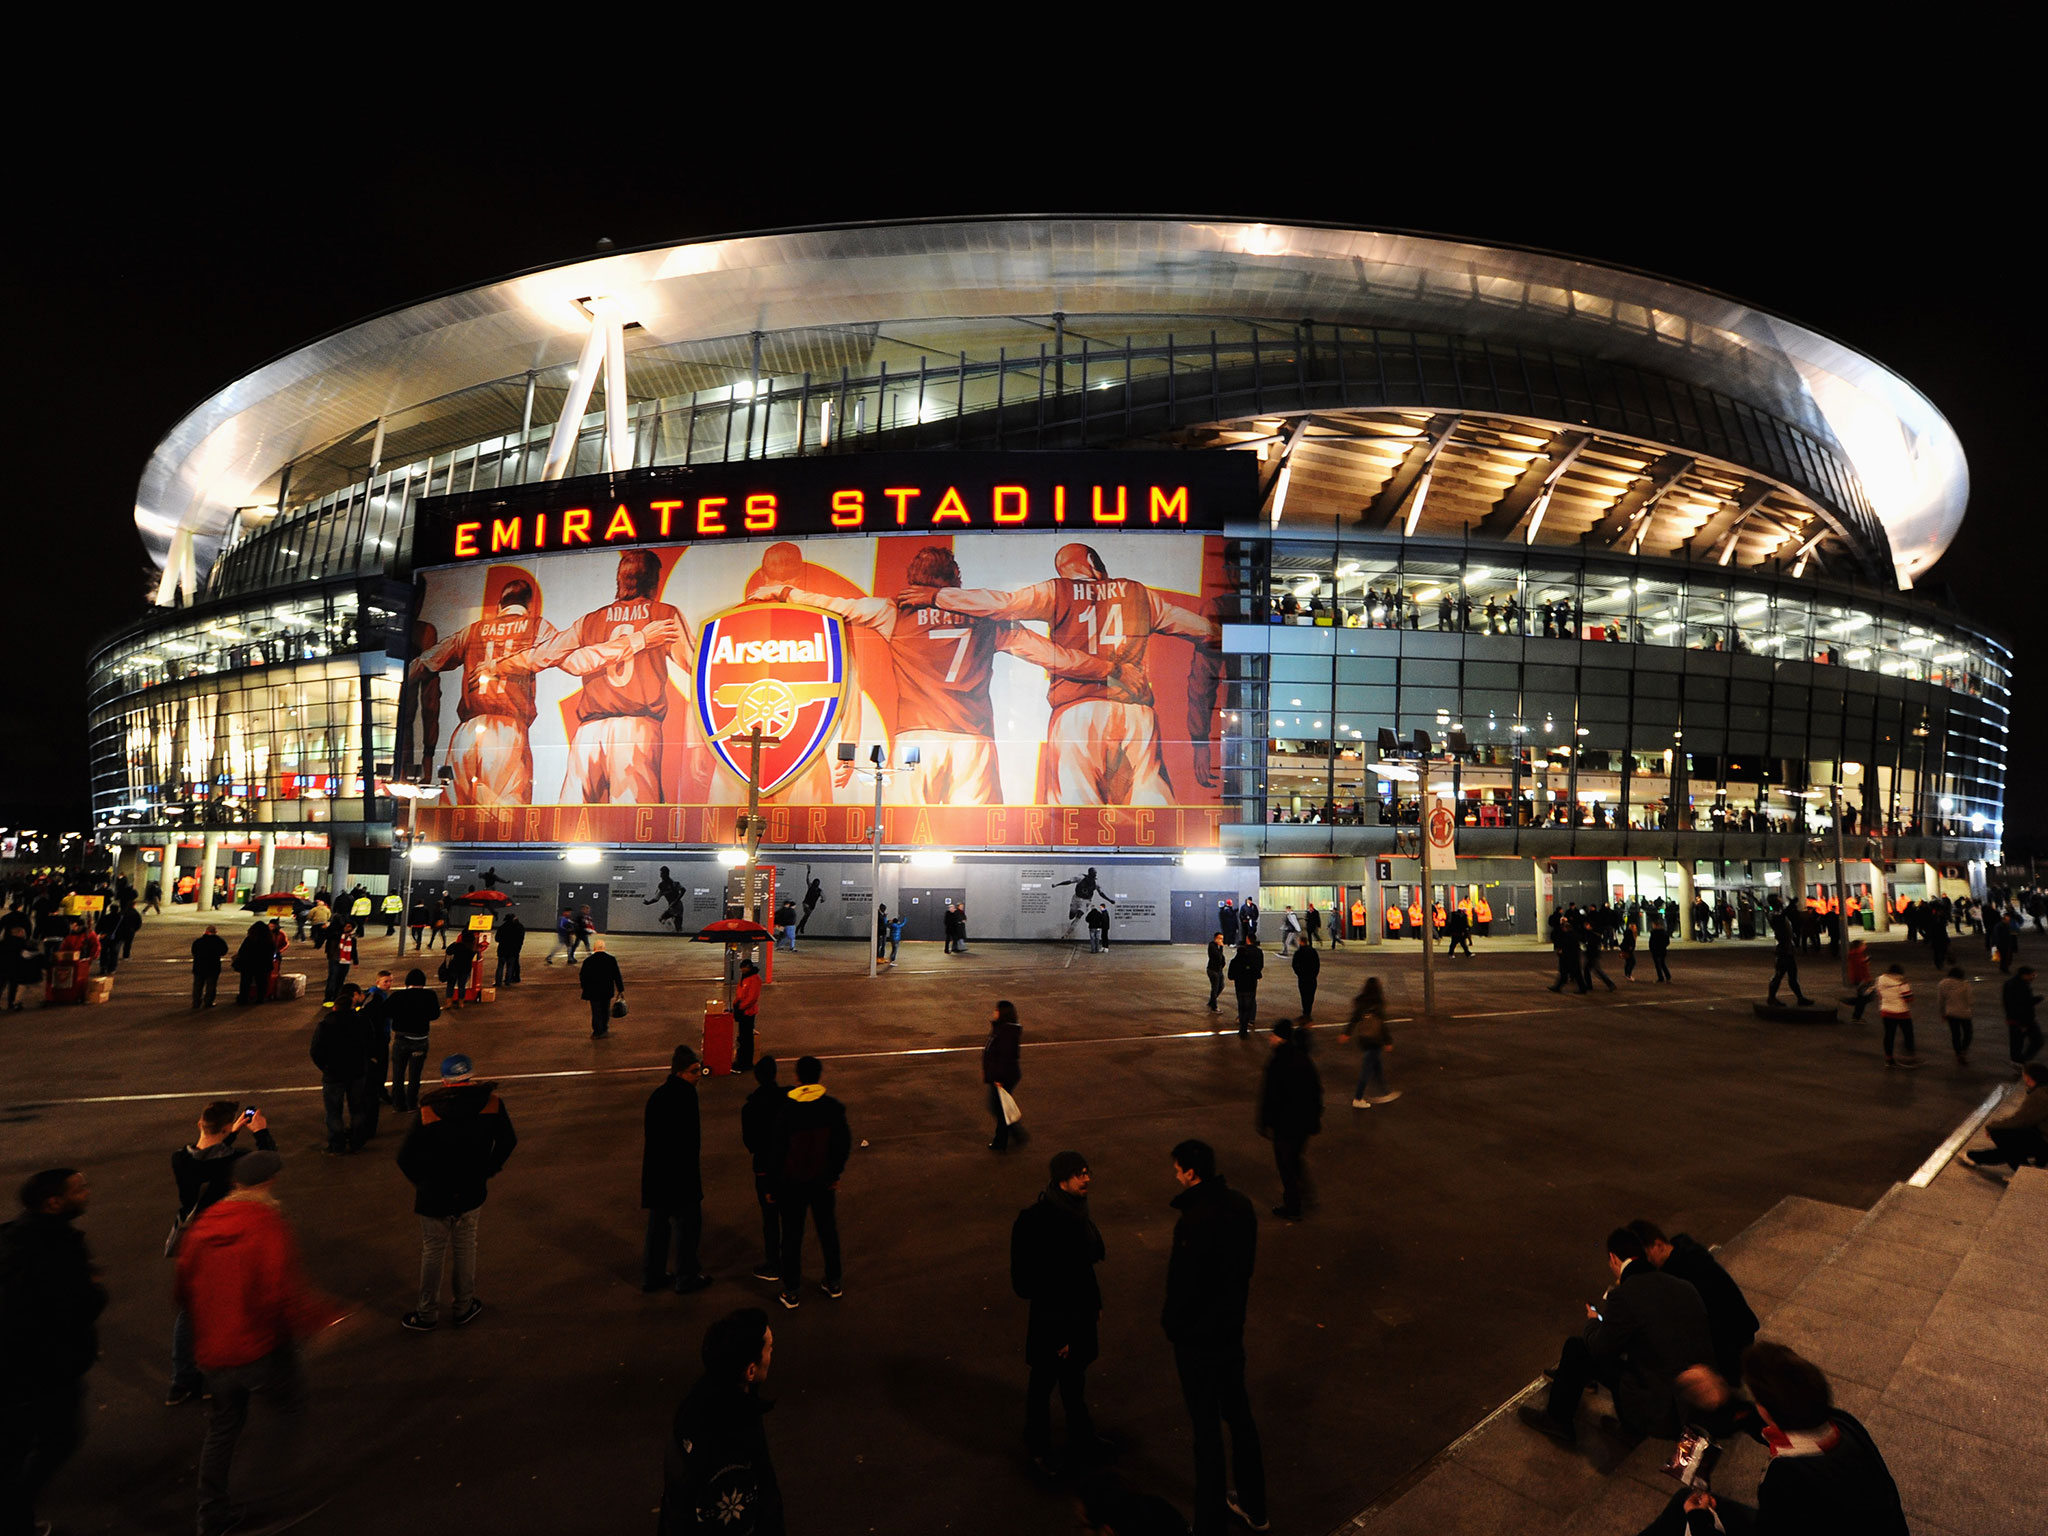 Wallpaper Arsenal Hd Arsenal Emirates Stadium Wallpaper Hd Pixelstalk Net